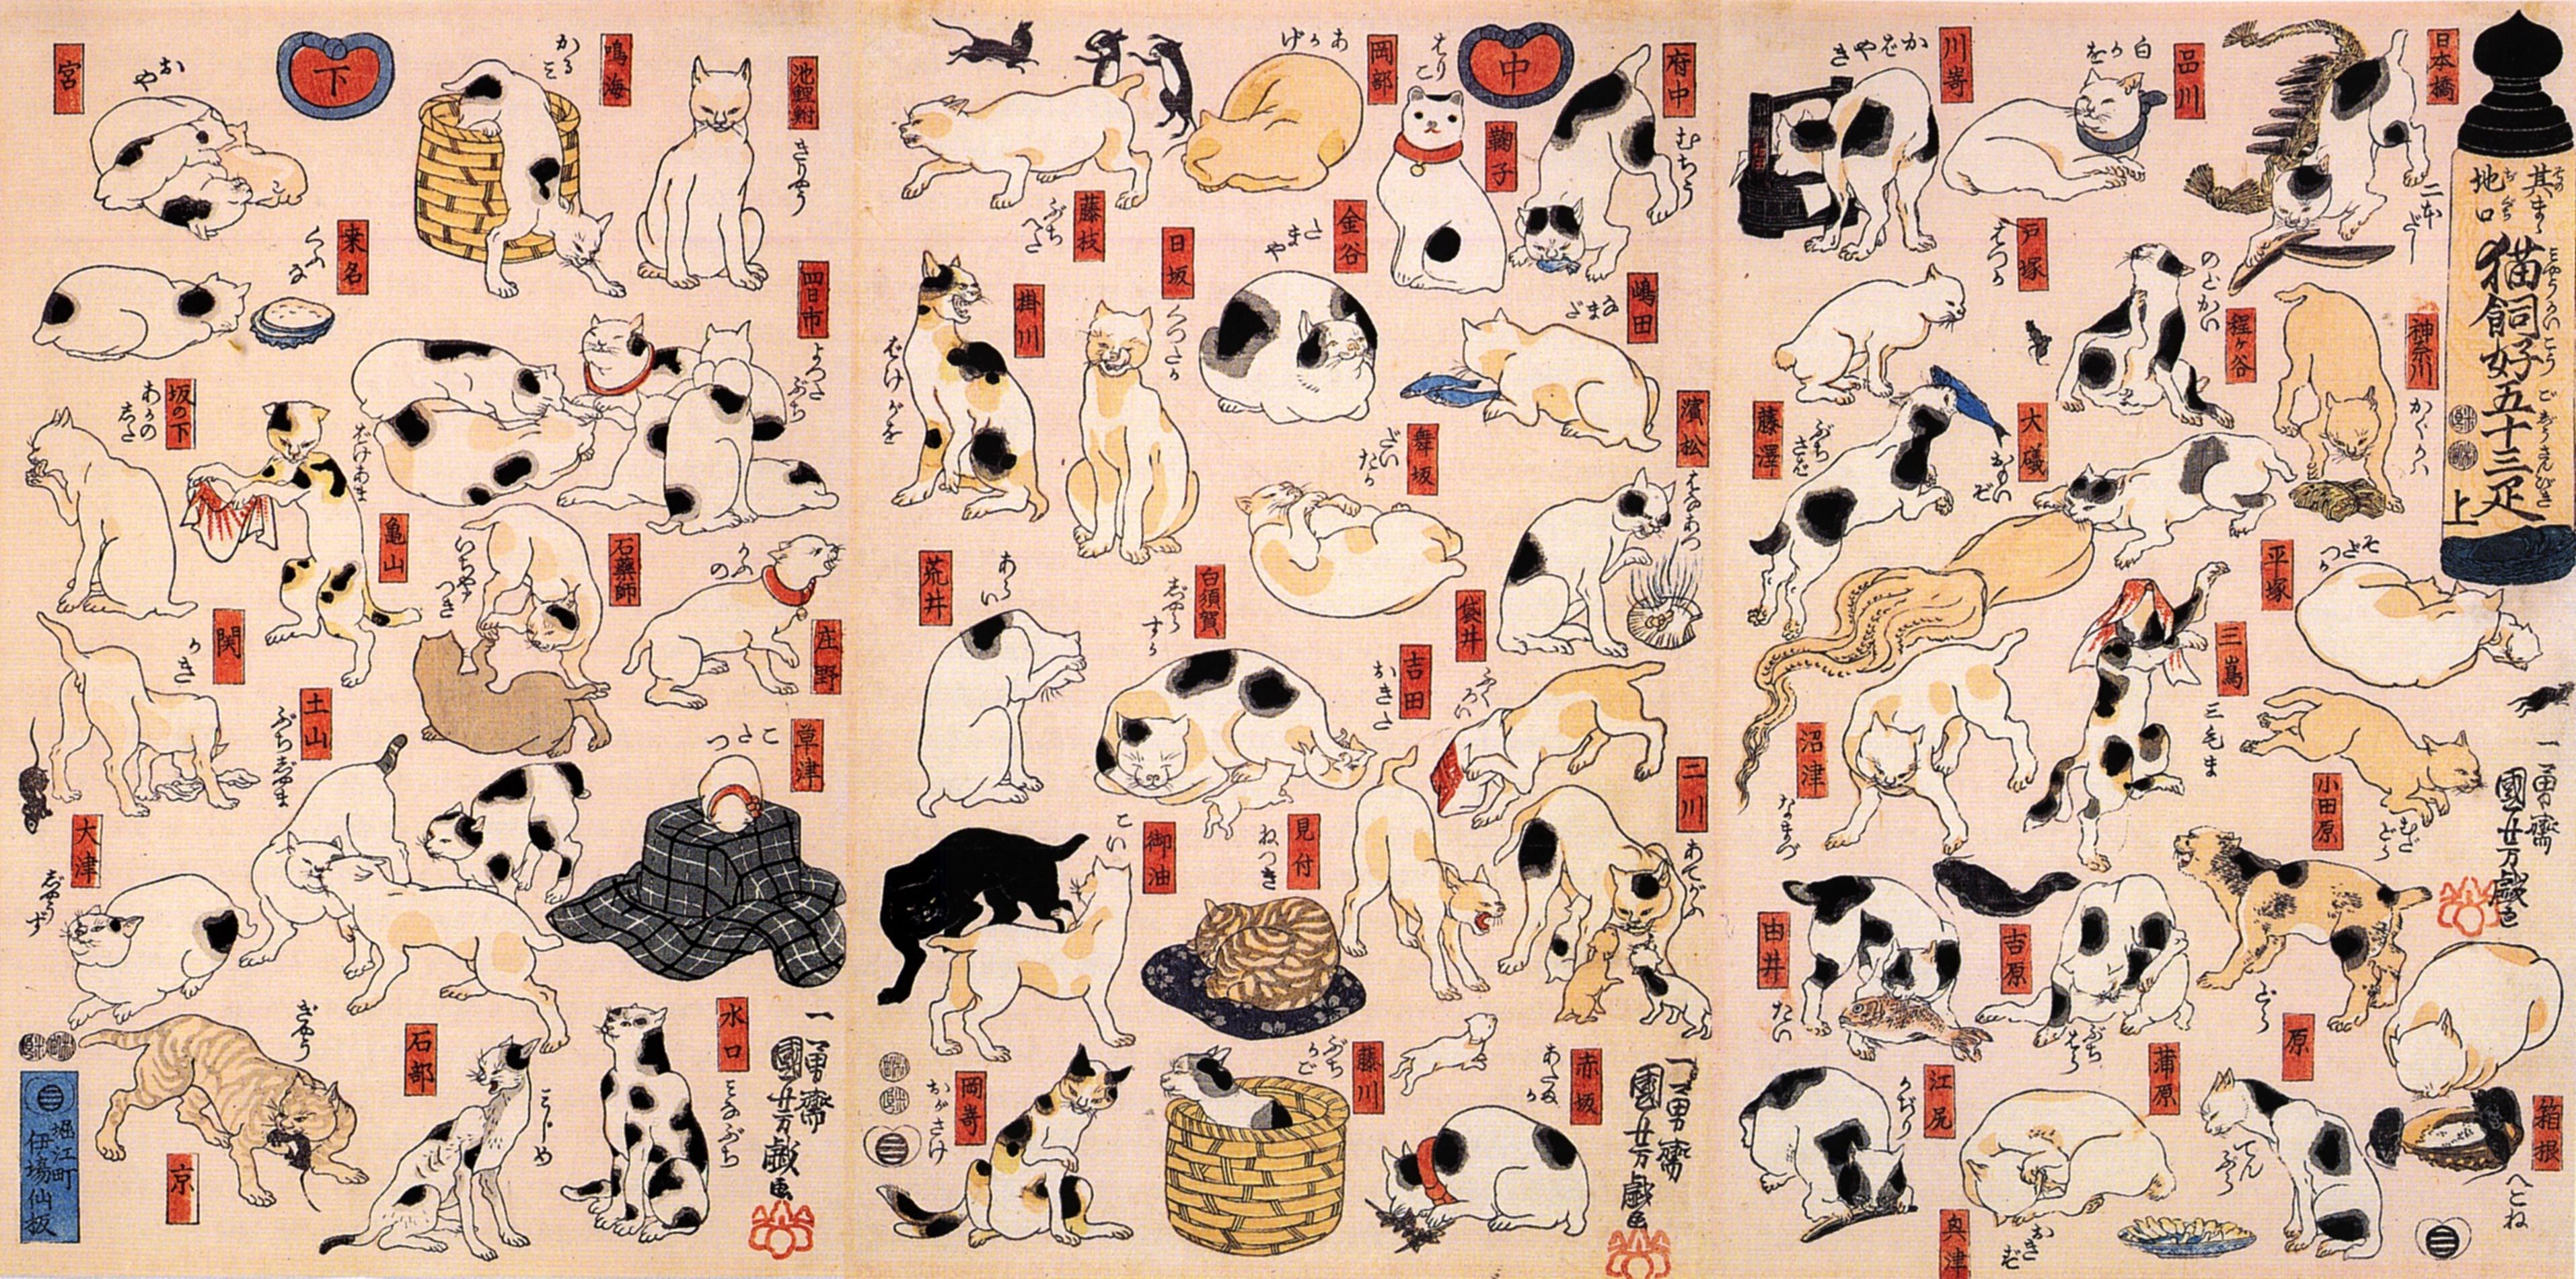 japanese dogu art history of the